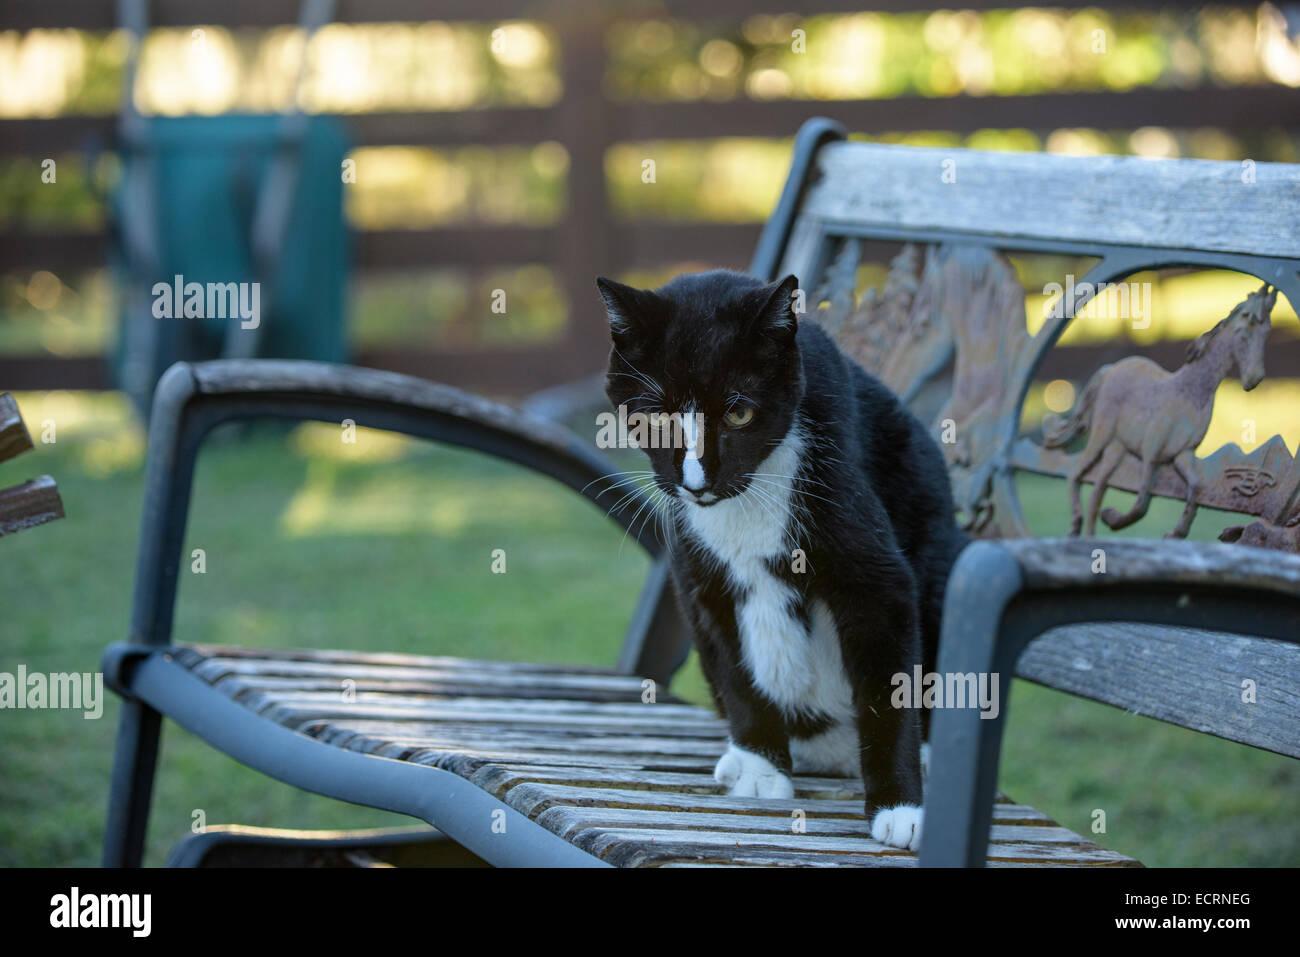 Aged barn cat pet sitting on bench - Stock Image